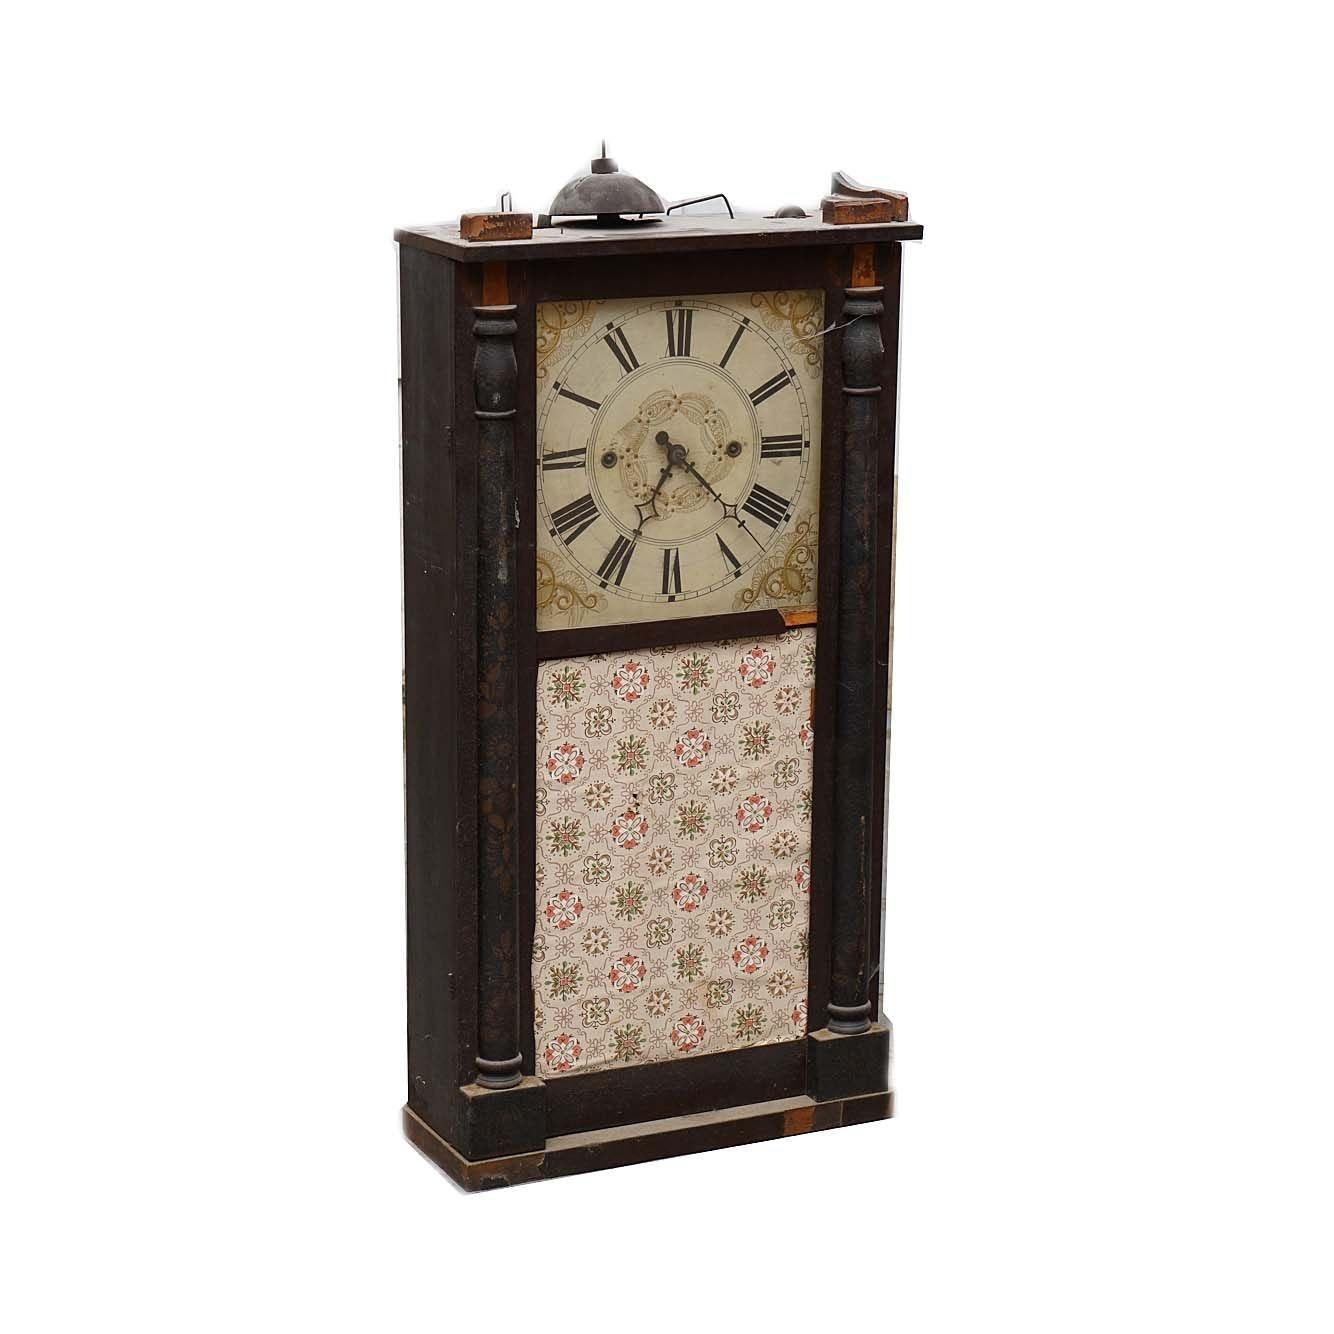 Antique Nantucket Henry A. Hinckley Ogee Clock Case